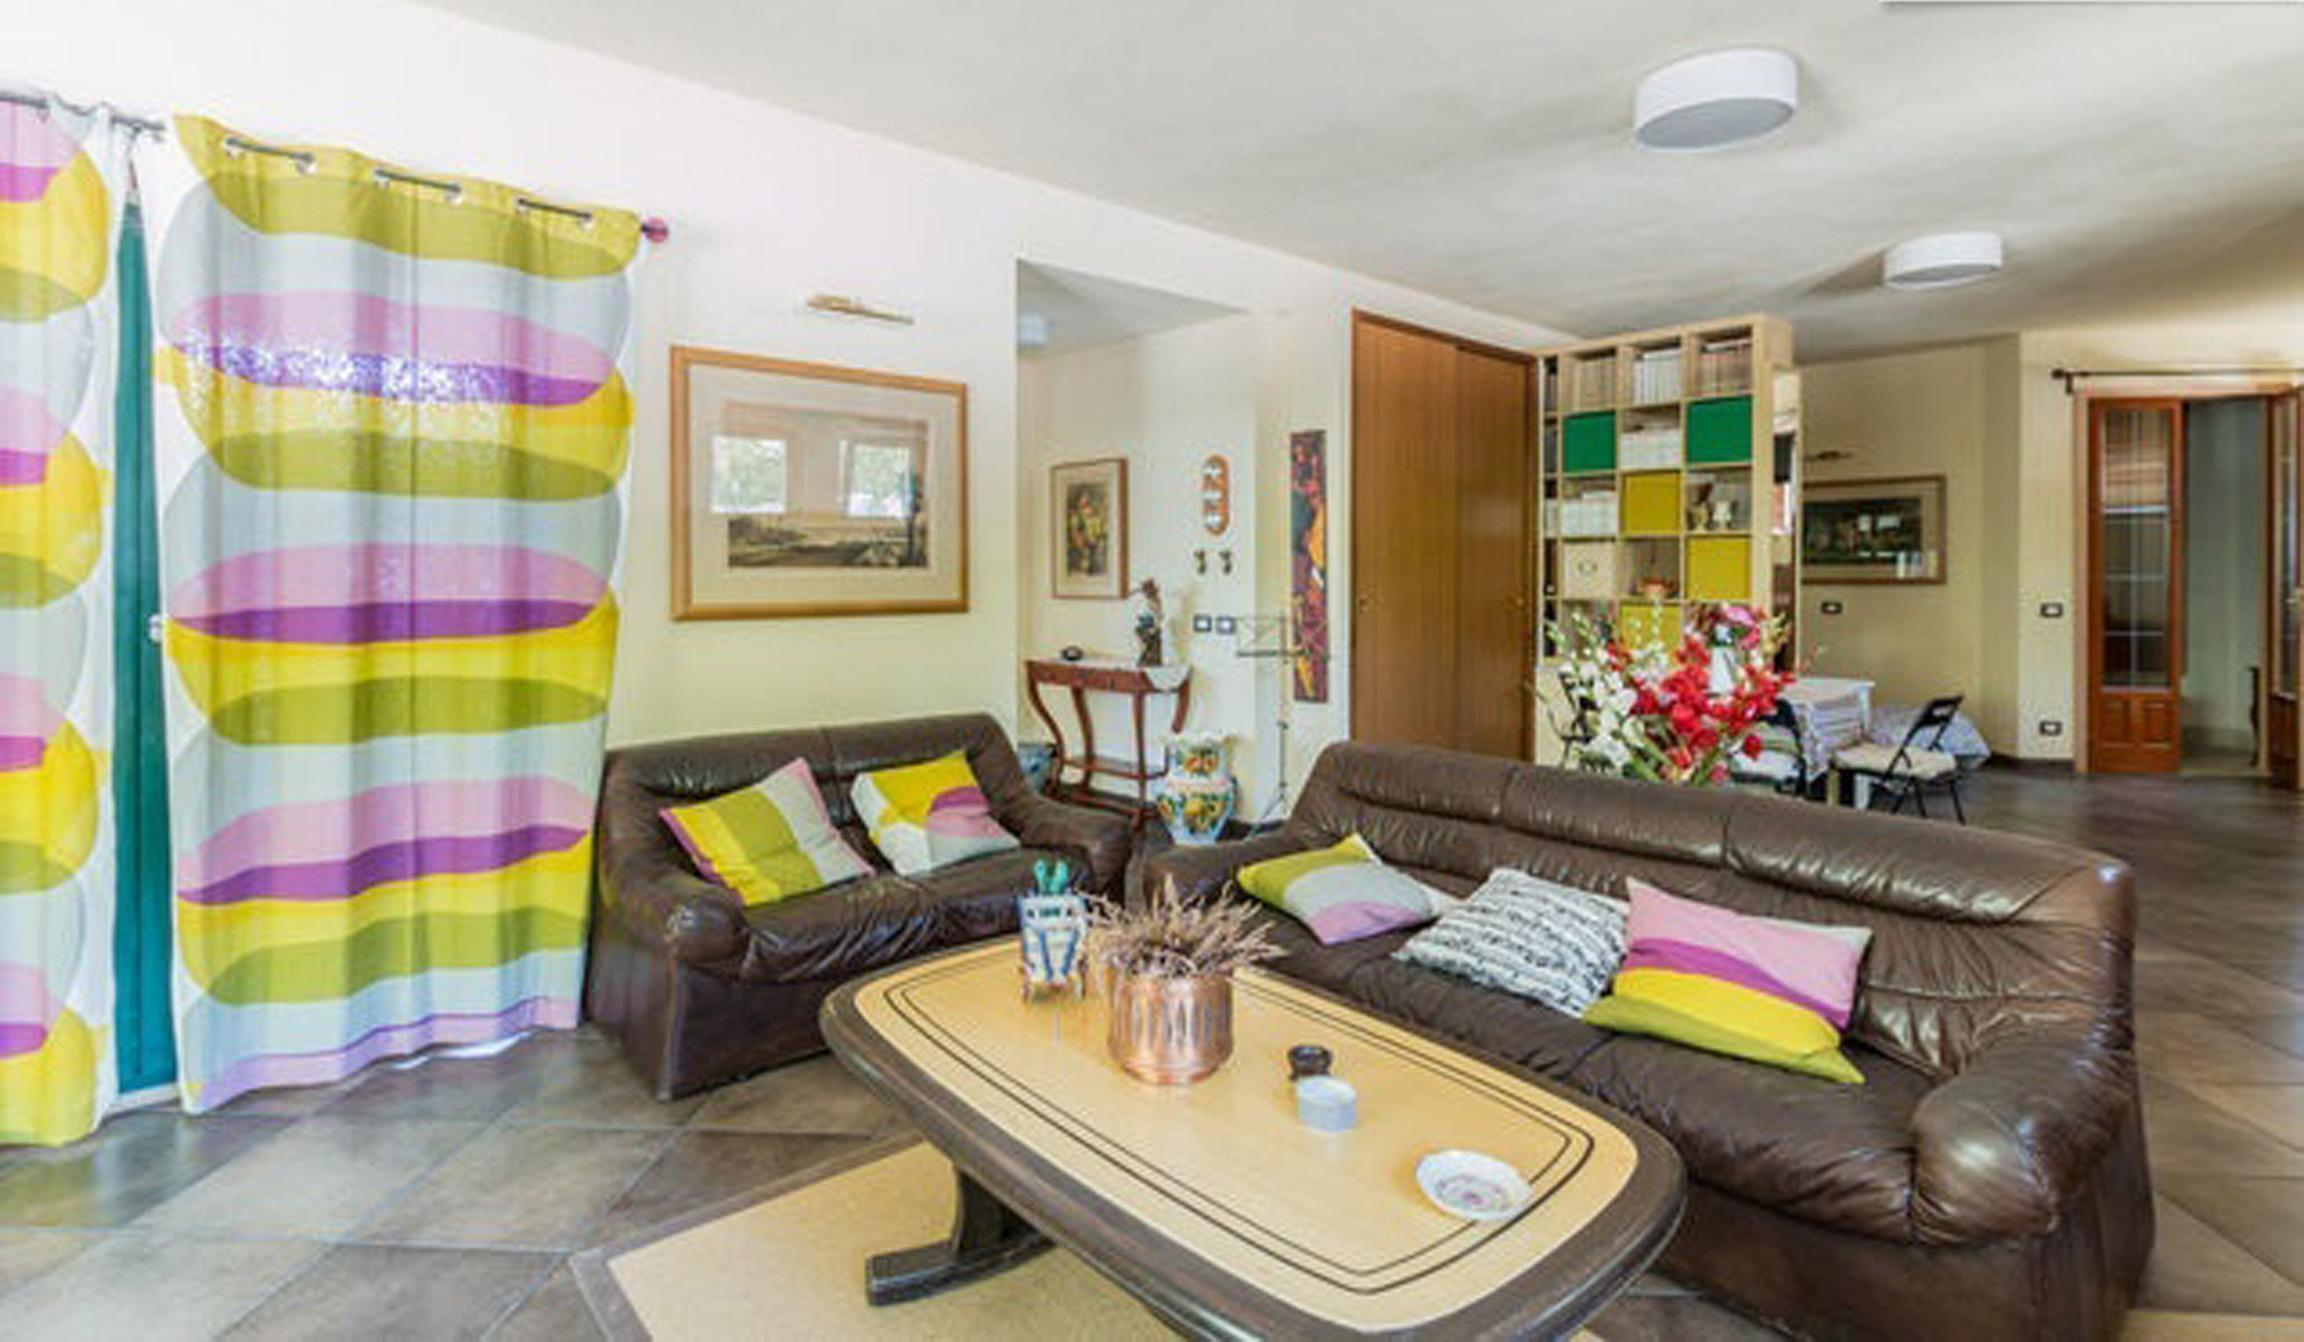 Appartement de vacances Carrubo (1730191), Modica, Ragusa, Sicile, Italie, image 6